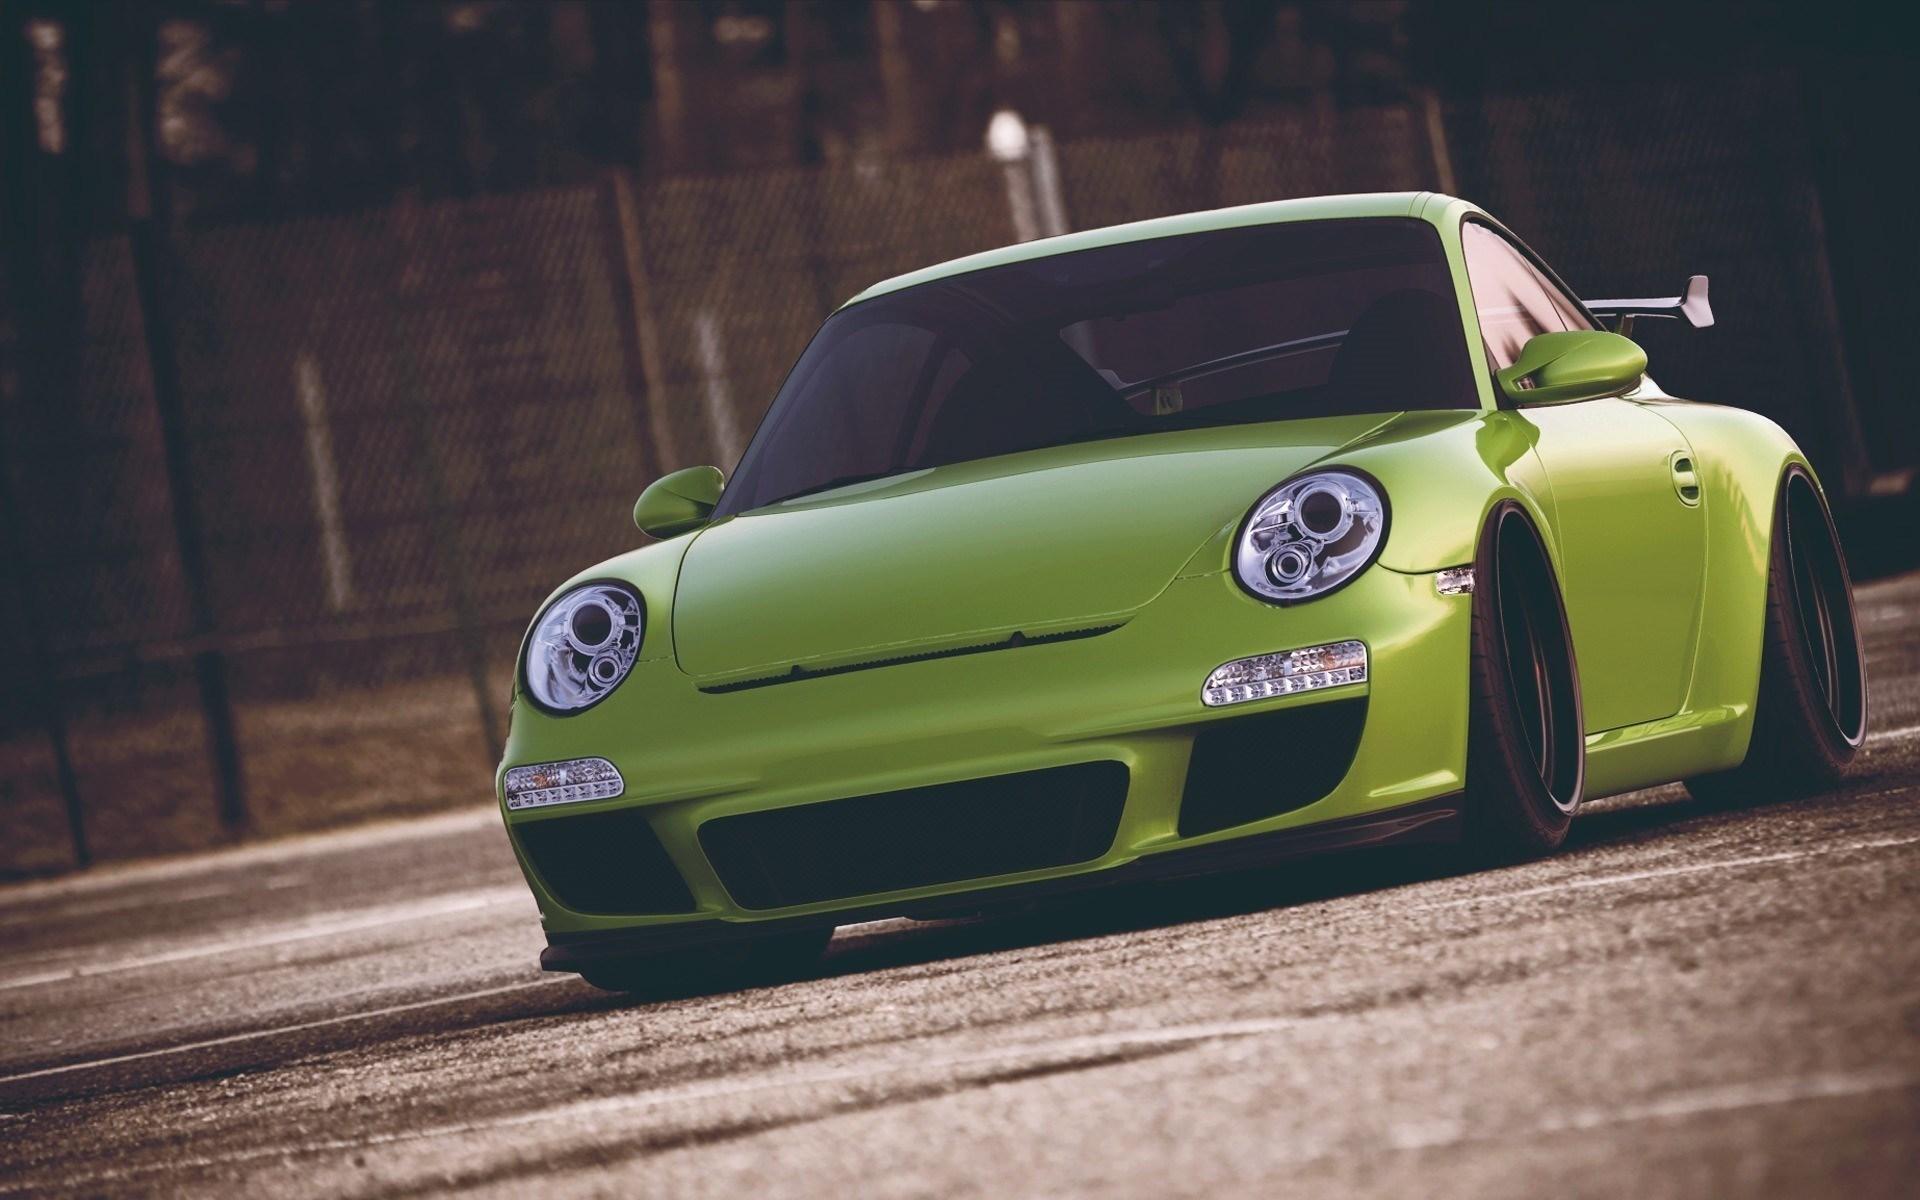 Porsche GT3 Lime